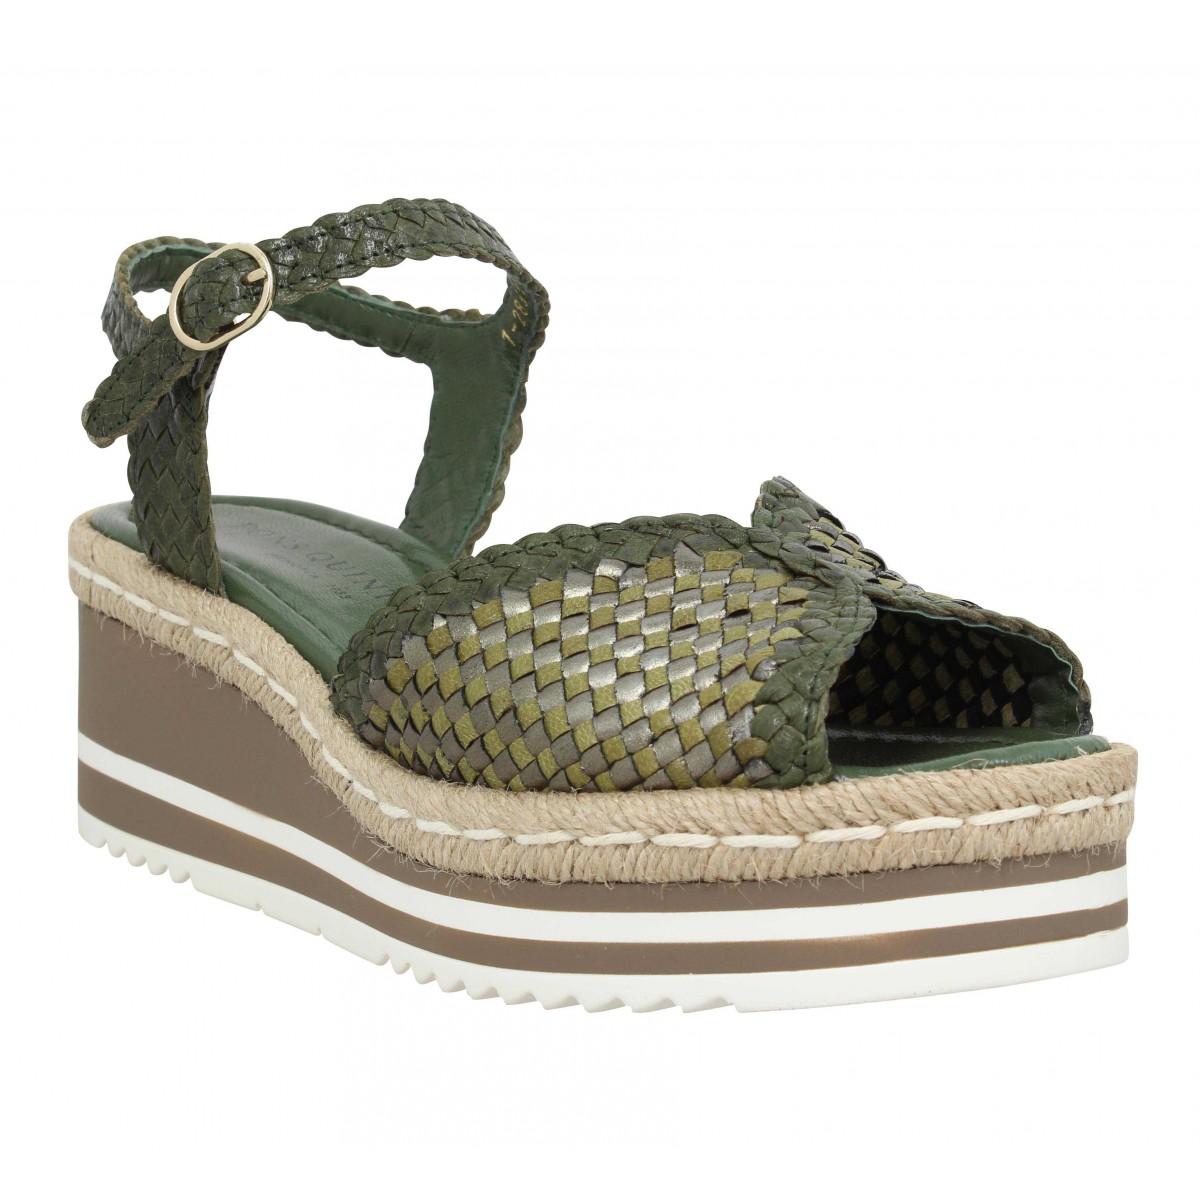 Sandales talons PONS QUINTANA 9096 cuir tresse Femme Olive